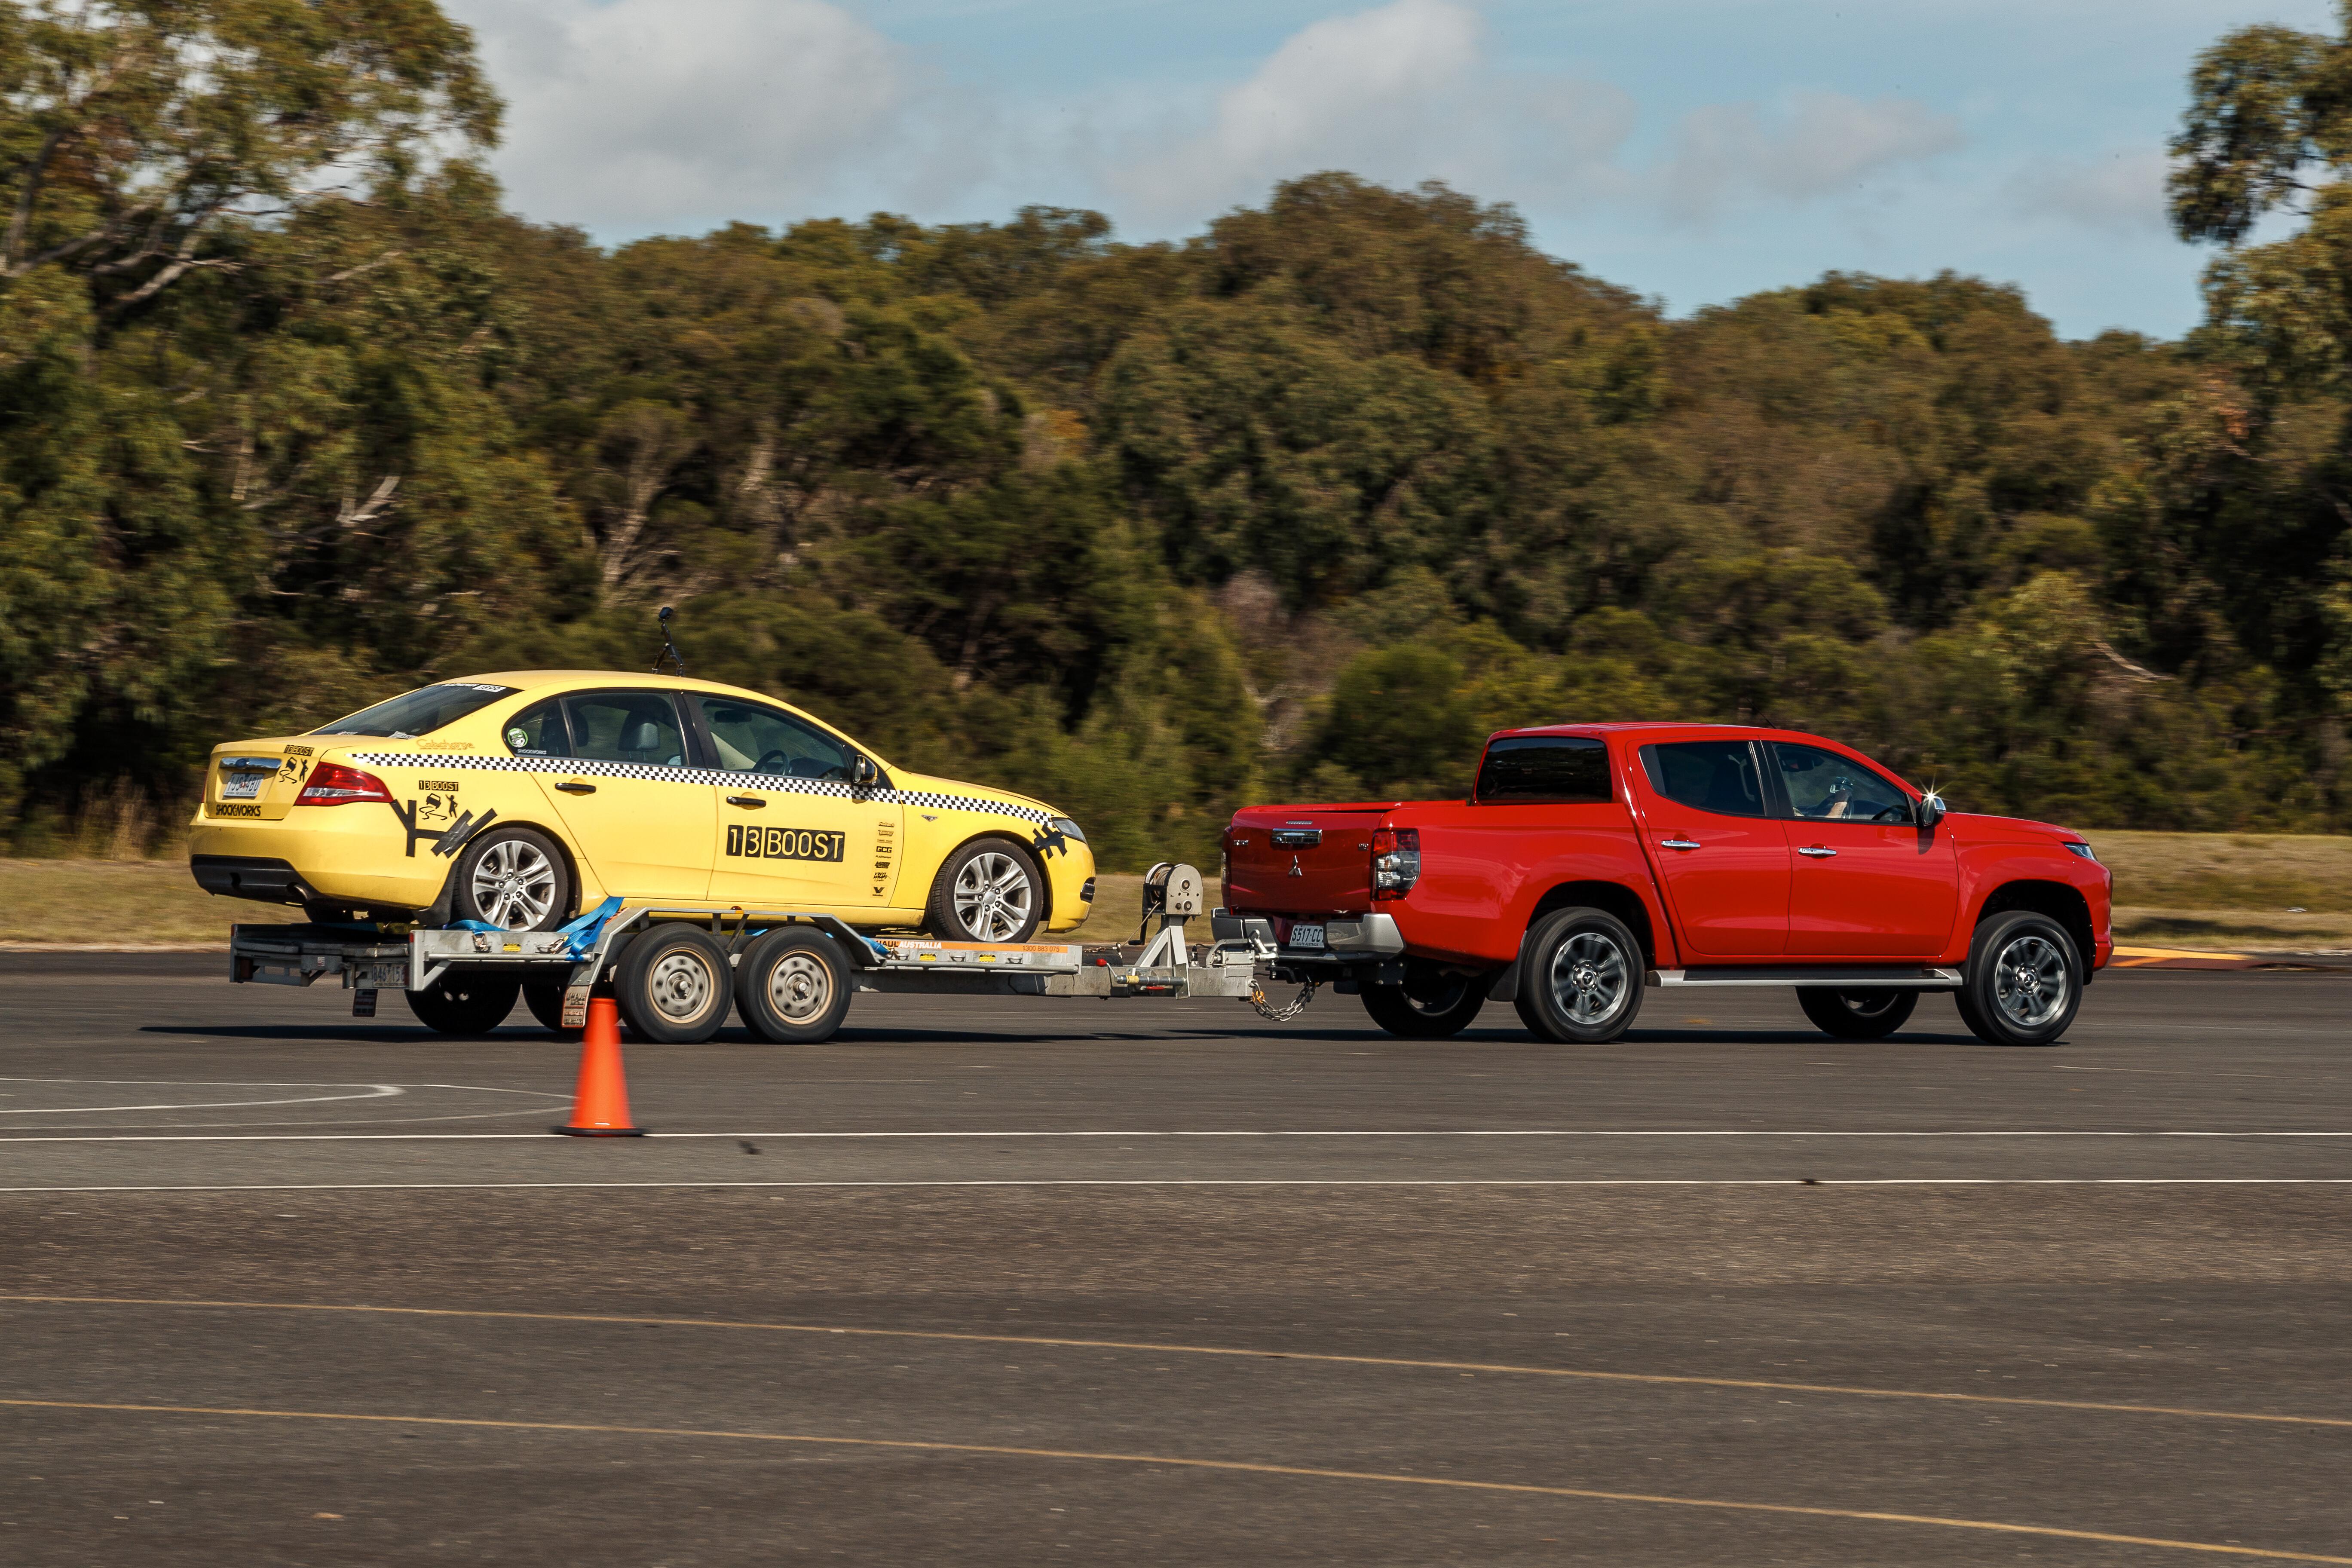 4 X 4 Australia Comparisons 2021 May 21 Mitubishi Triton GLS Towing Performance